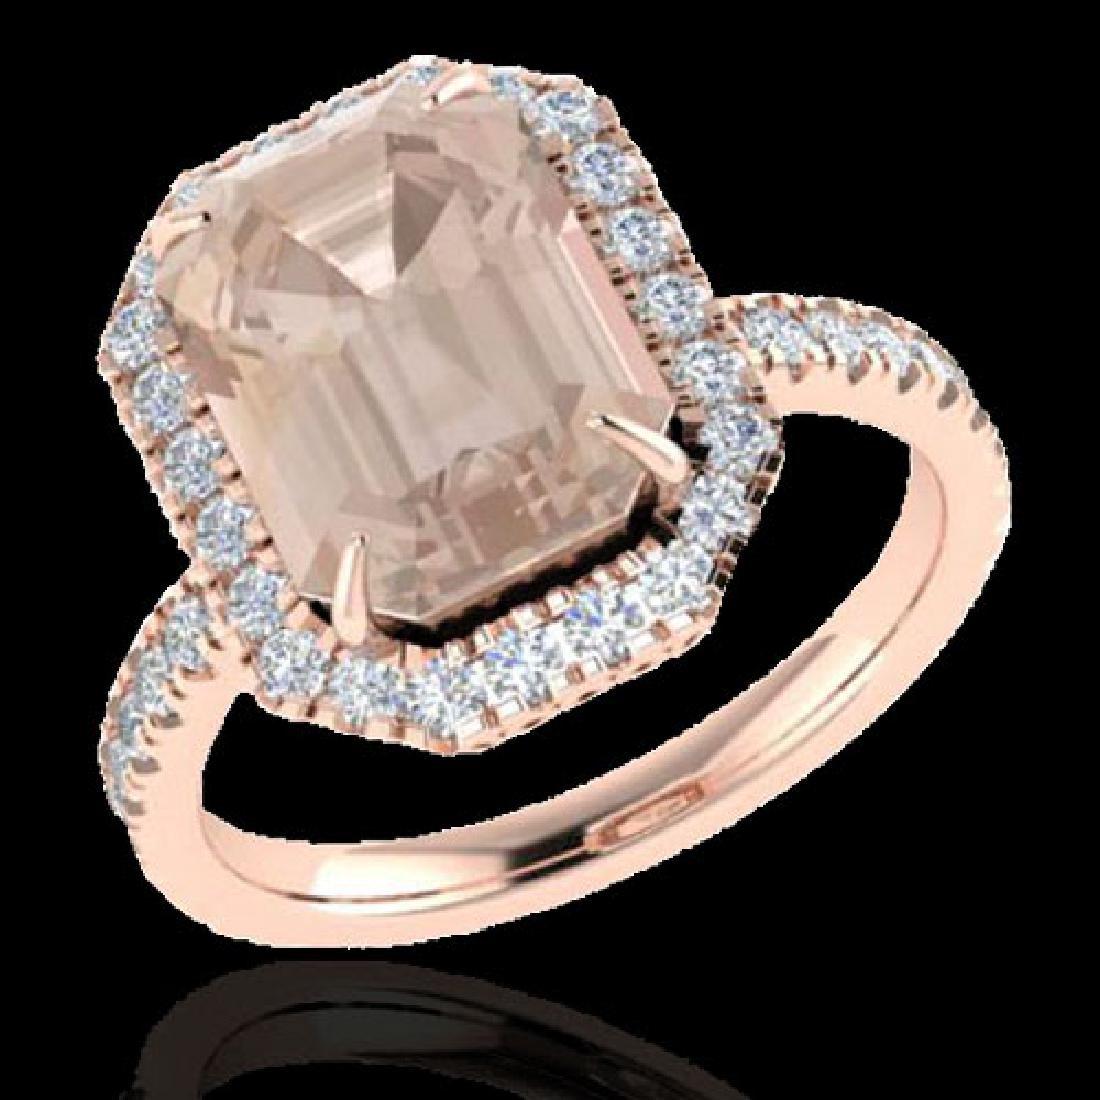 4.50 CTW Morganite & Micro Pave VS/SI Diamond Halo Ring